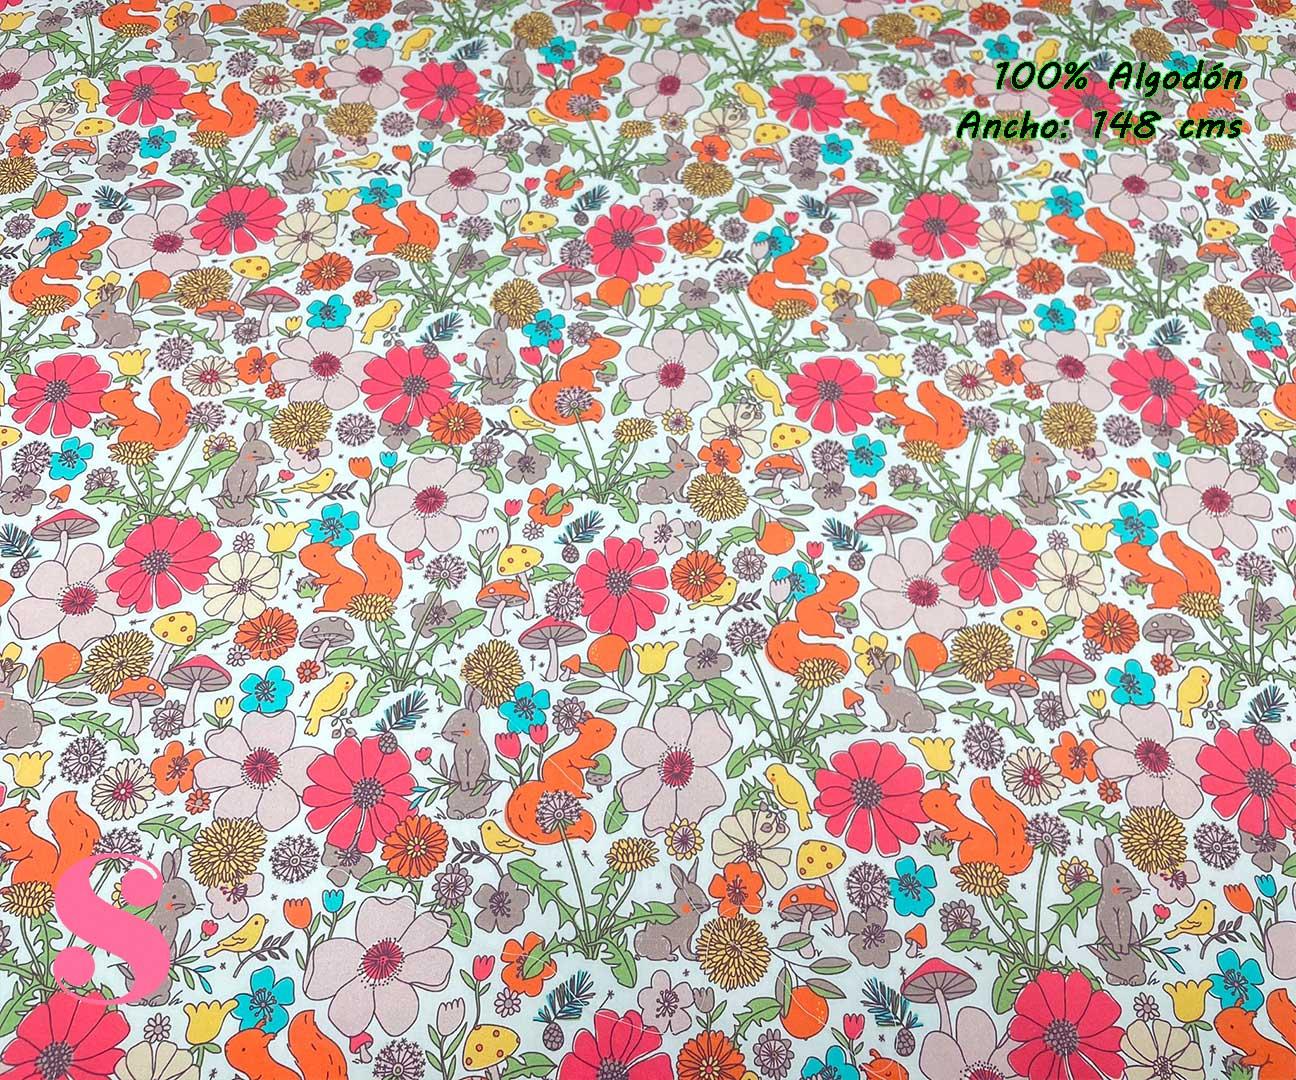 46-telas-estampadas-de-algodón,-telas-floreadas,estampados-floreados-de-algodón,estampados-origonales-de-algodón,Tejido Estampado Flores y Animales